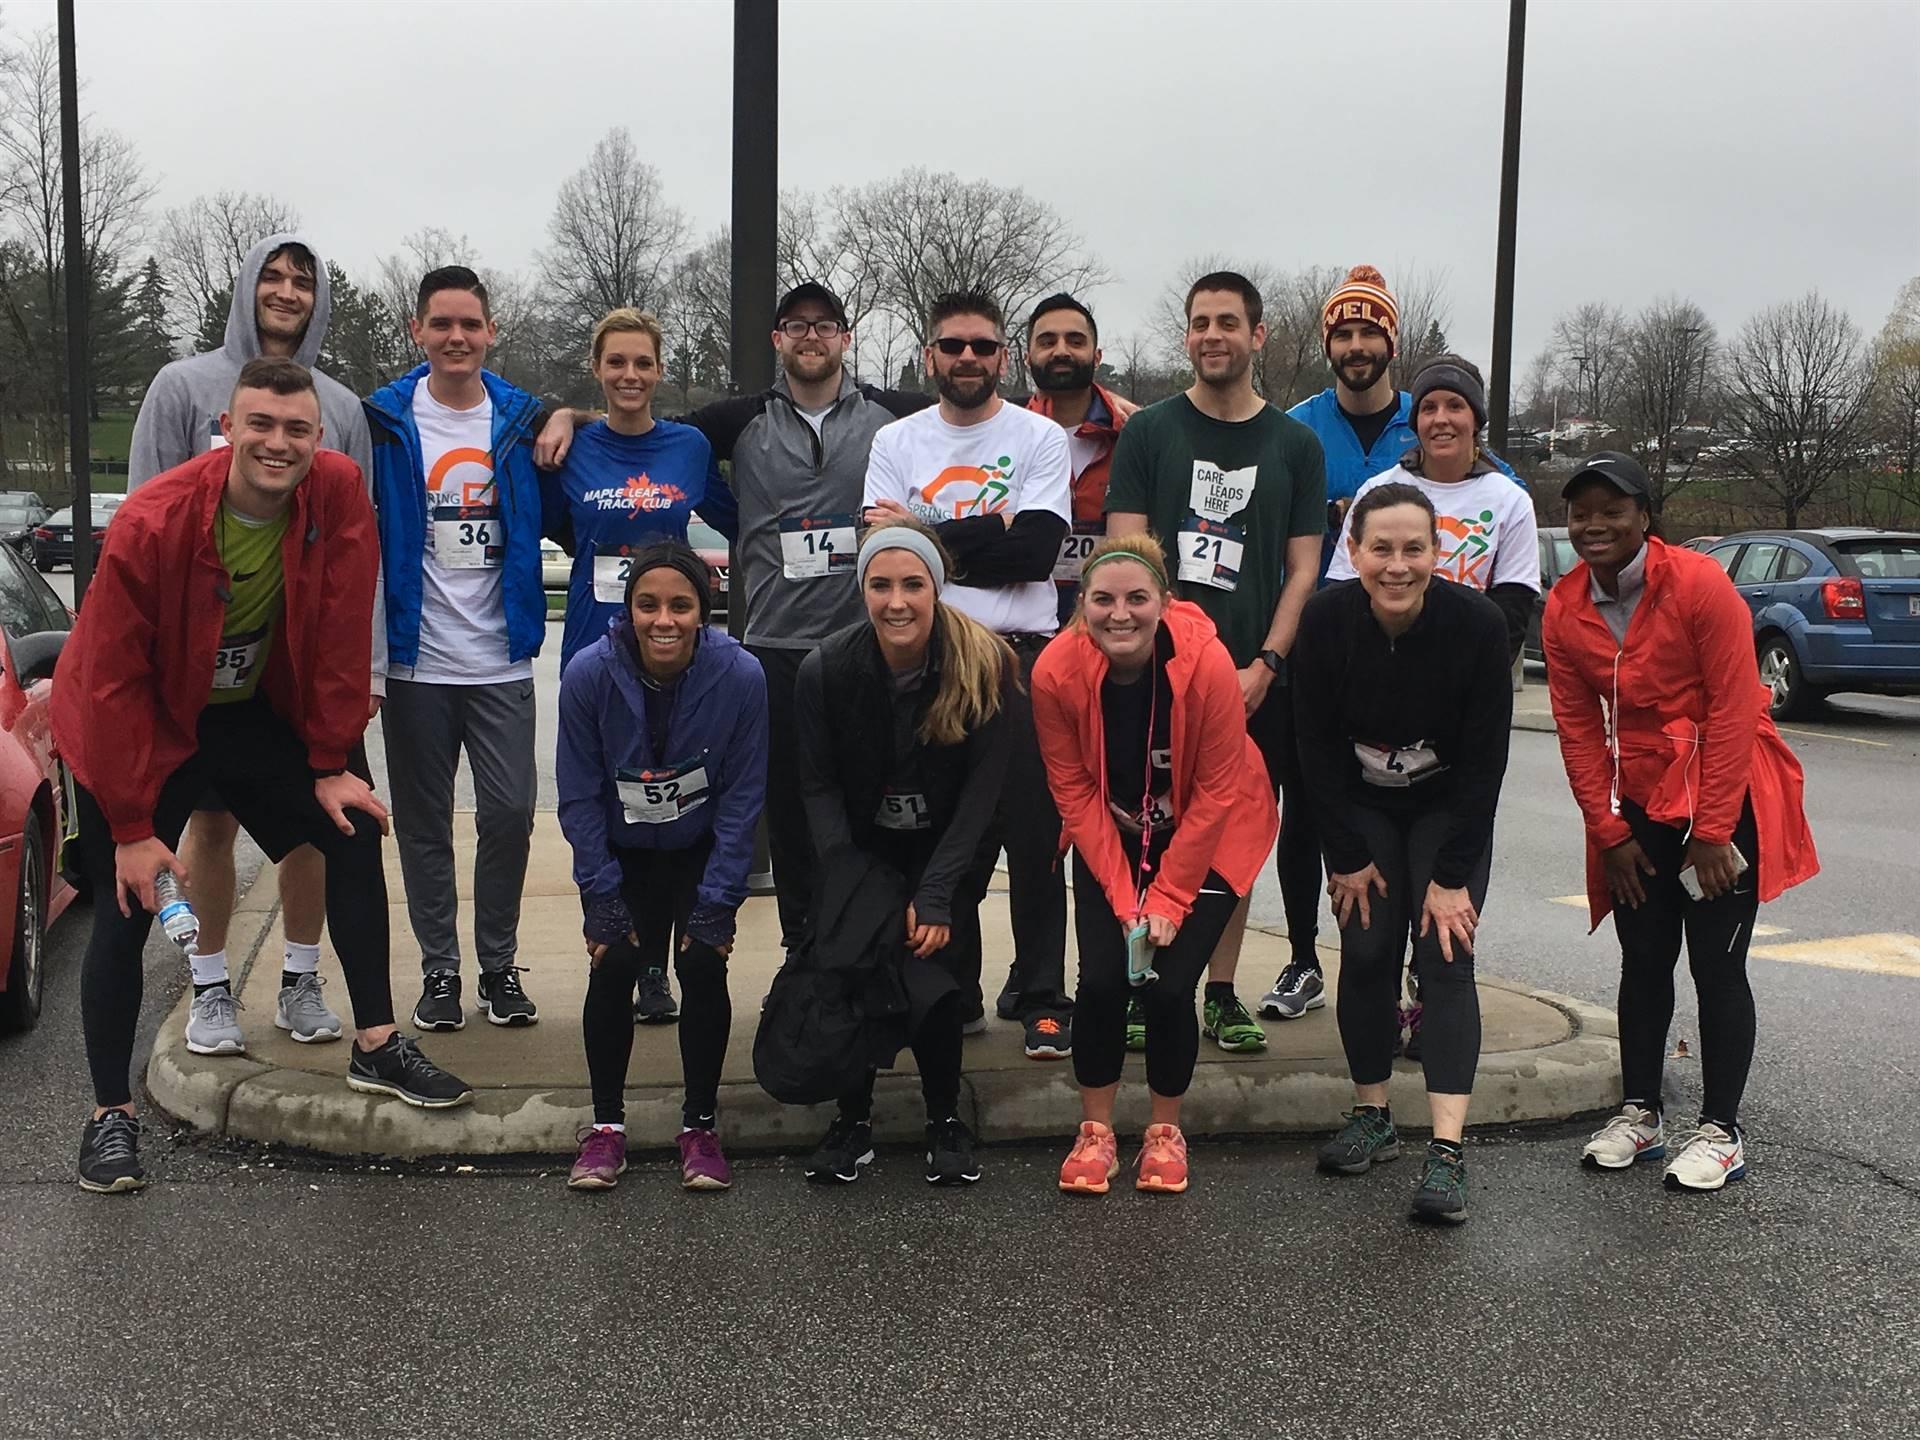 Ohio U. participants